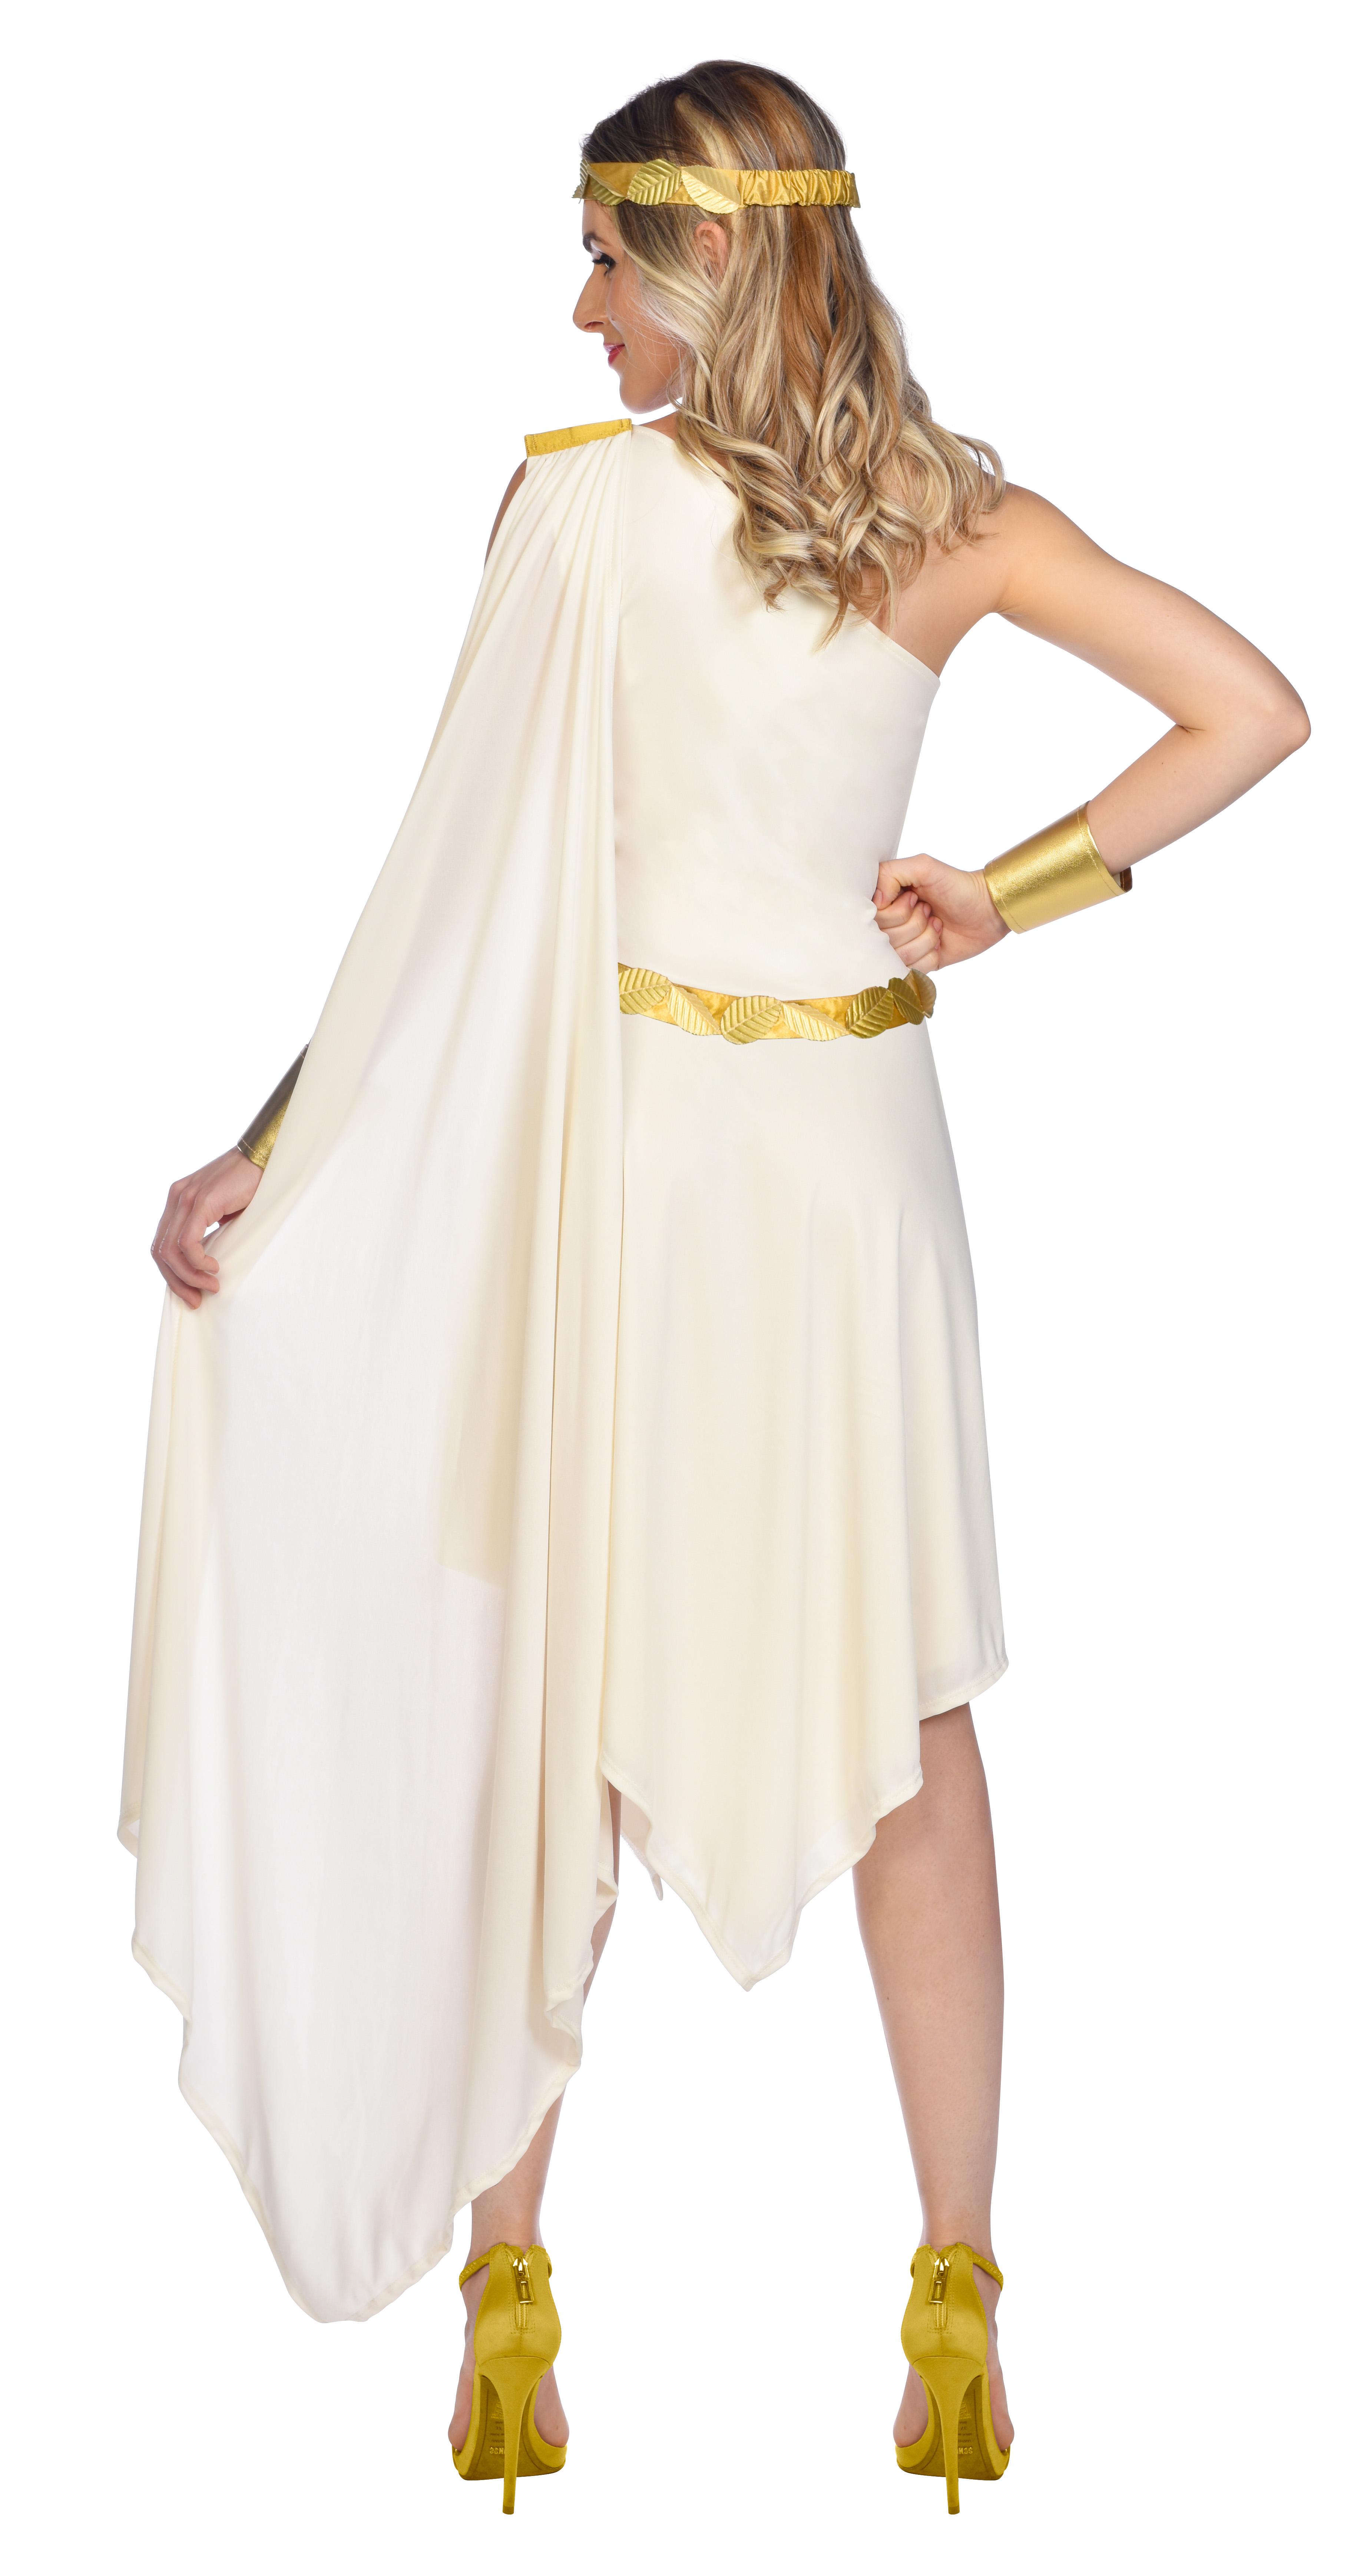 Indexbild 29 - Adult Ladies Golden Goddess Gladiator Greek Roman Toga Fancy Dress Costume New